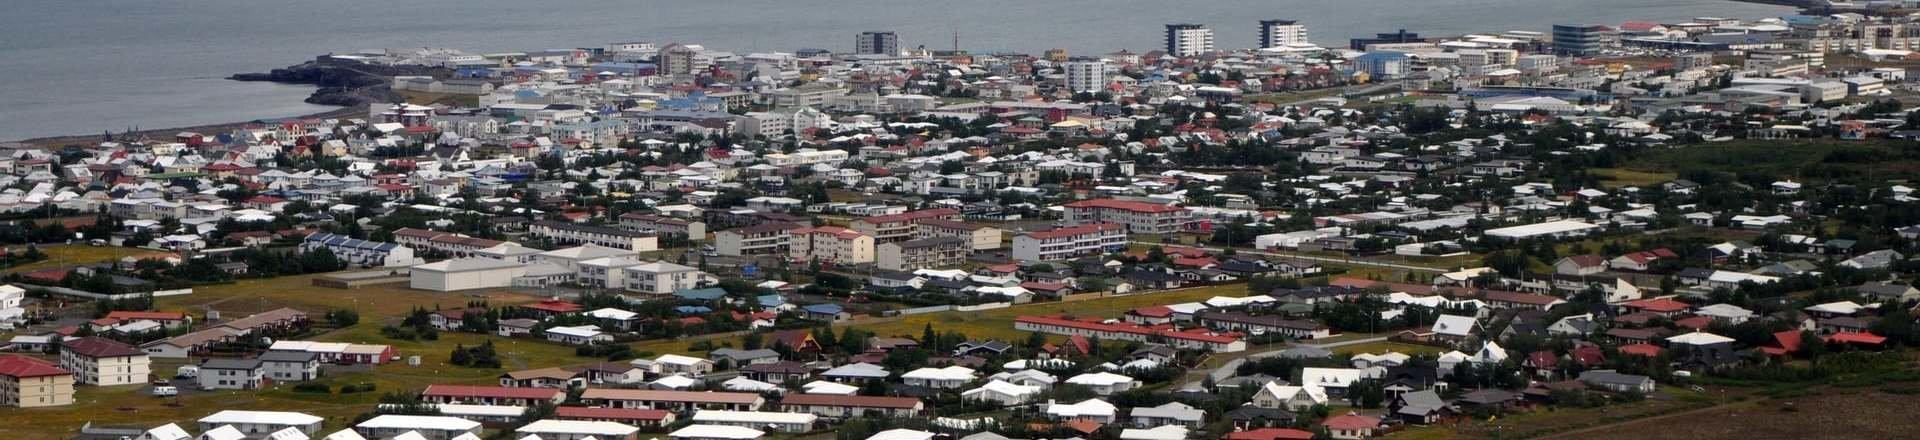 Cheap Hotels In Keflavik